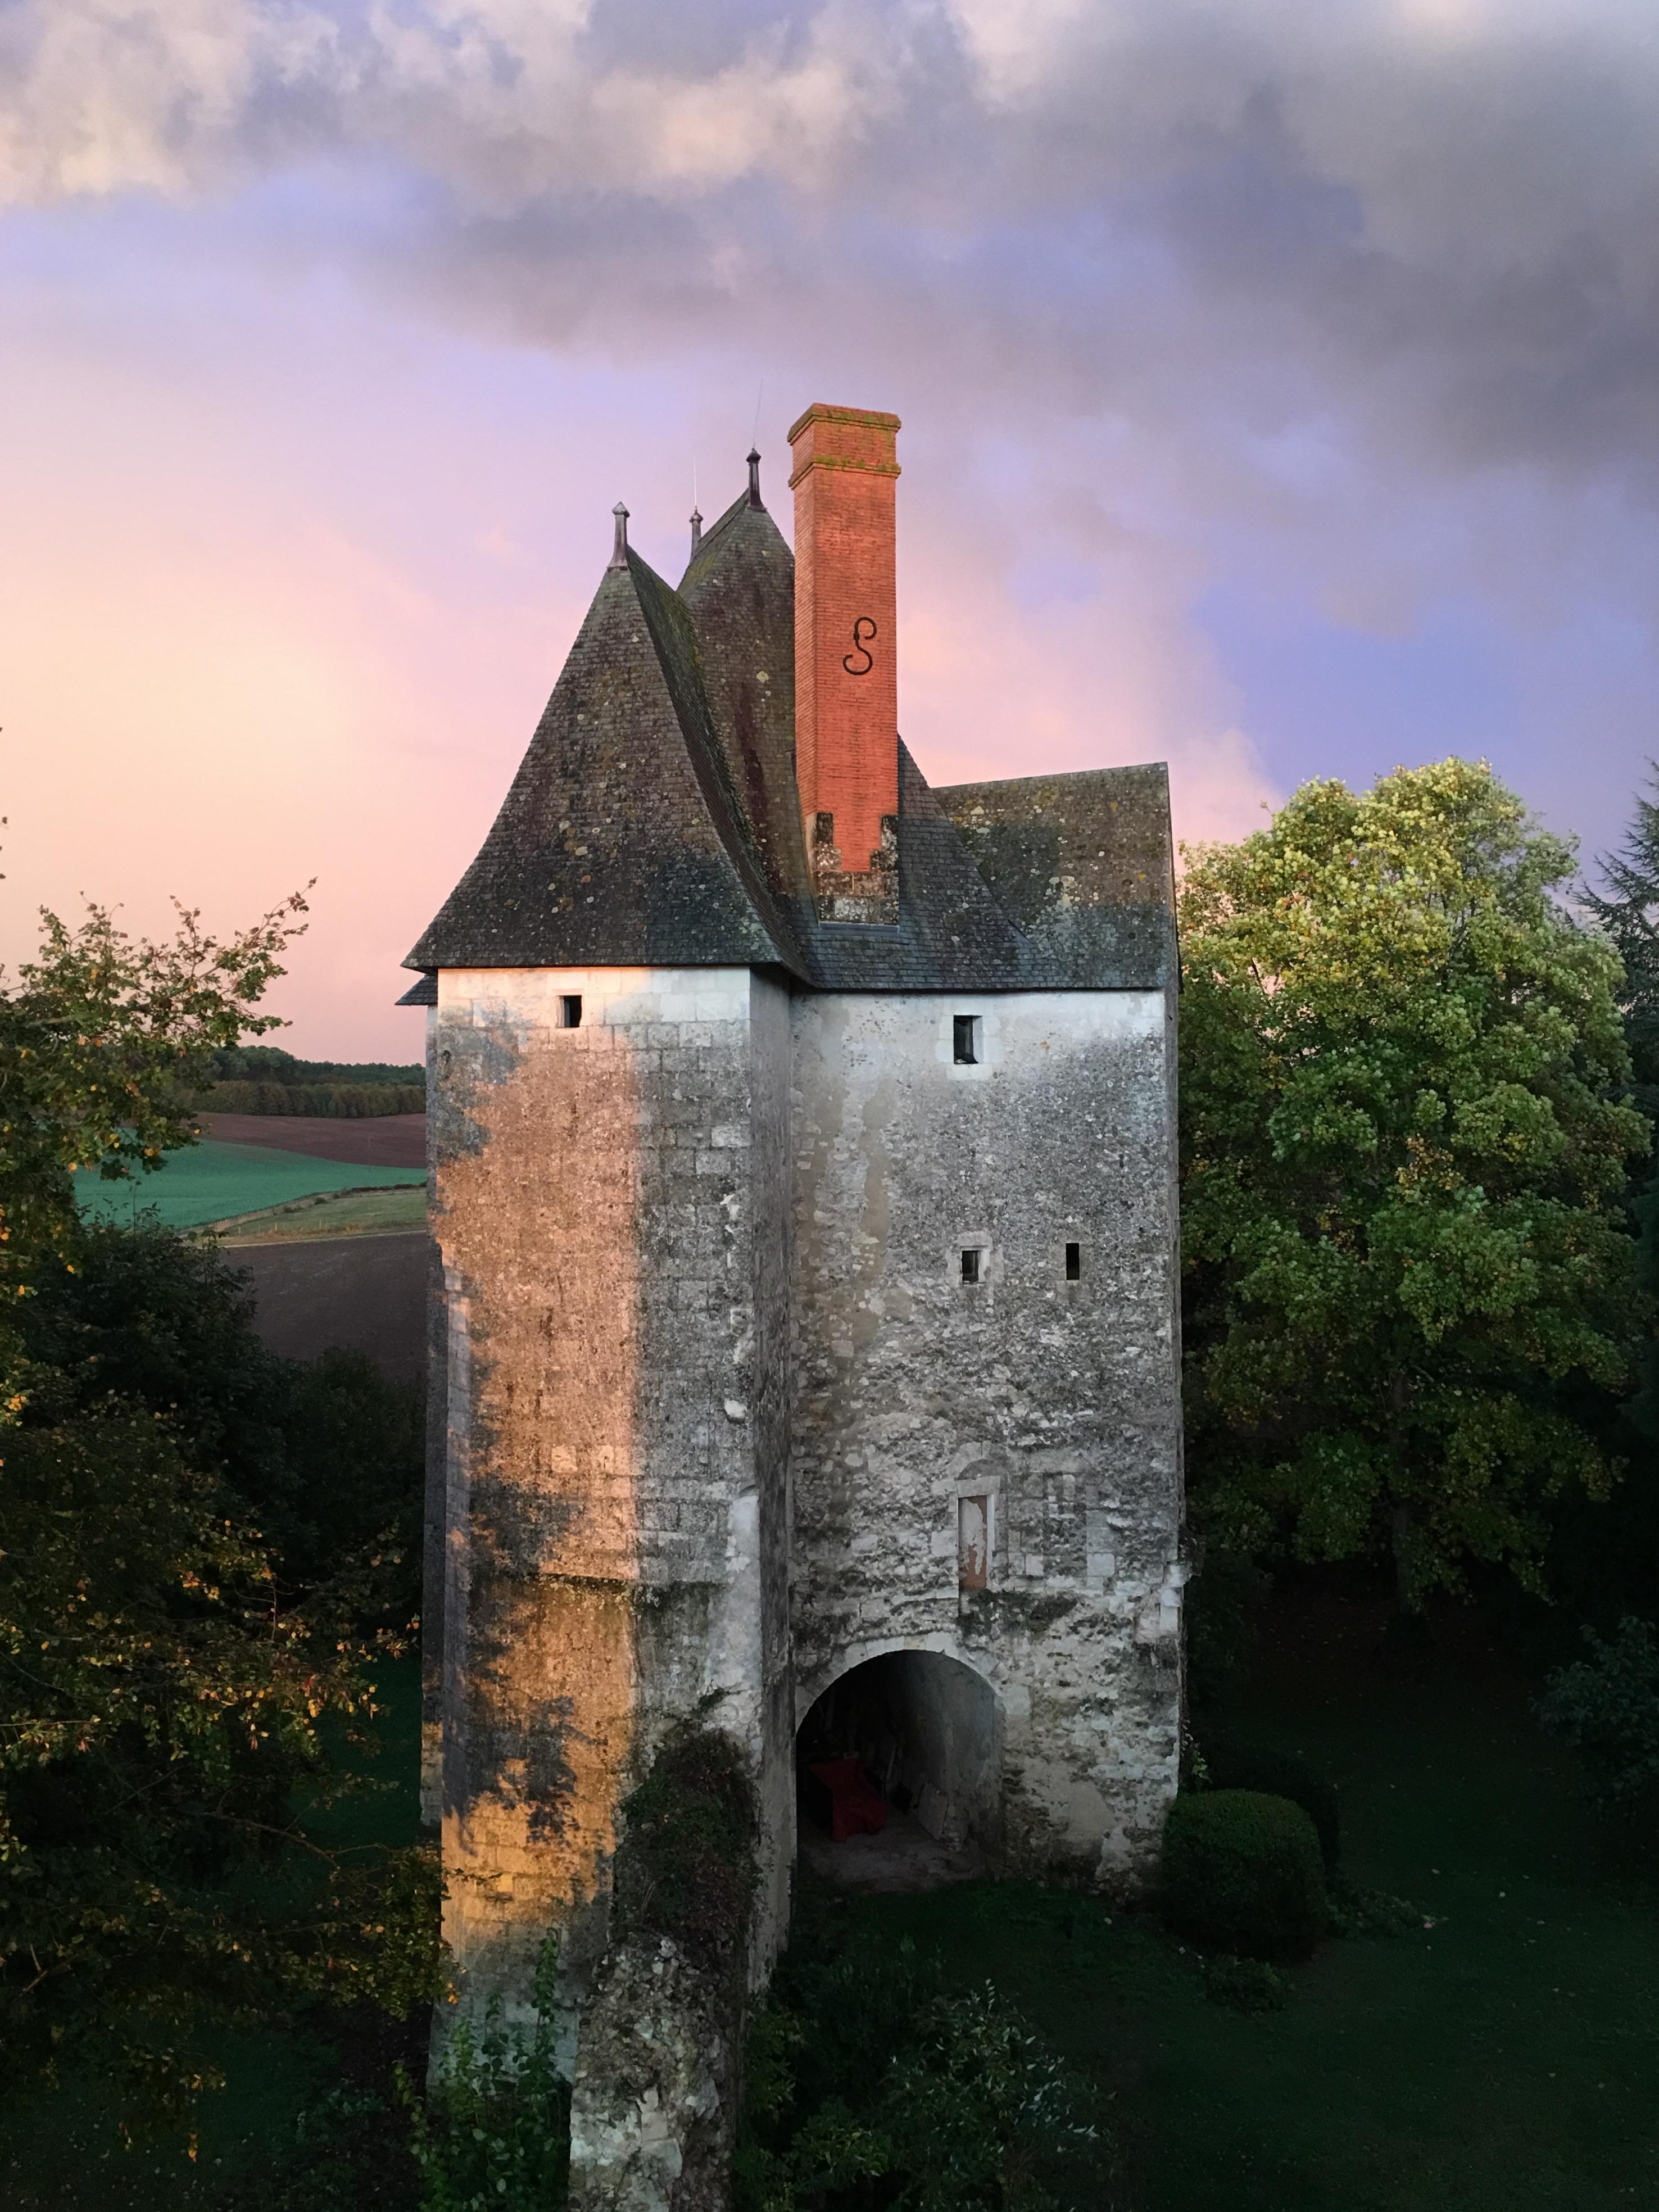 1545-s-chateau-classe-du-14eme-1178